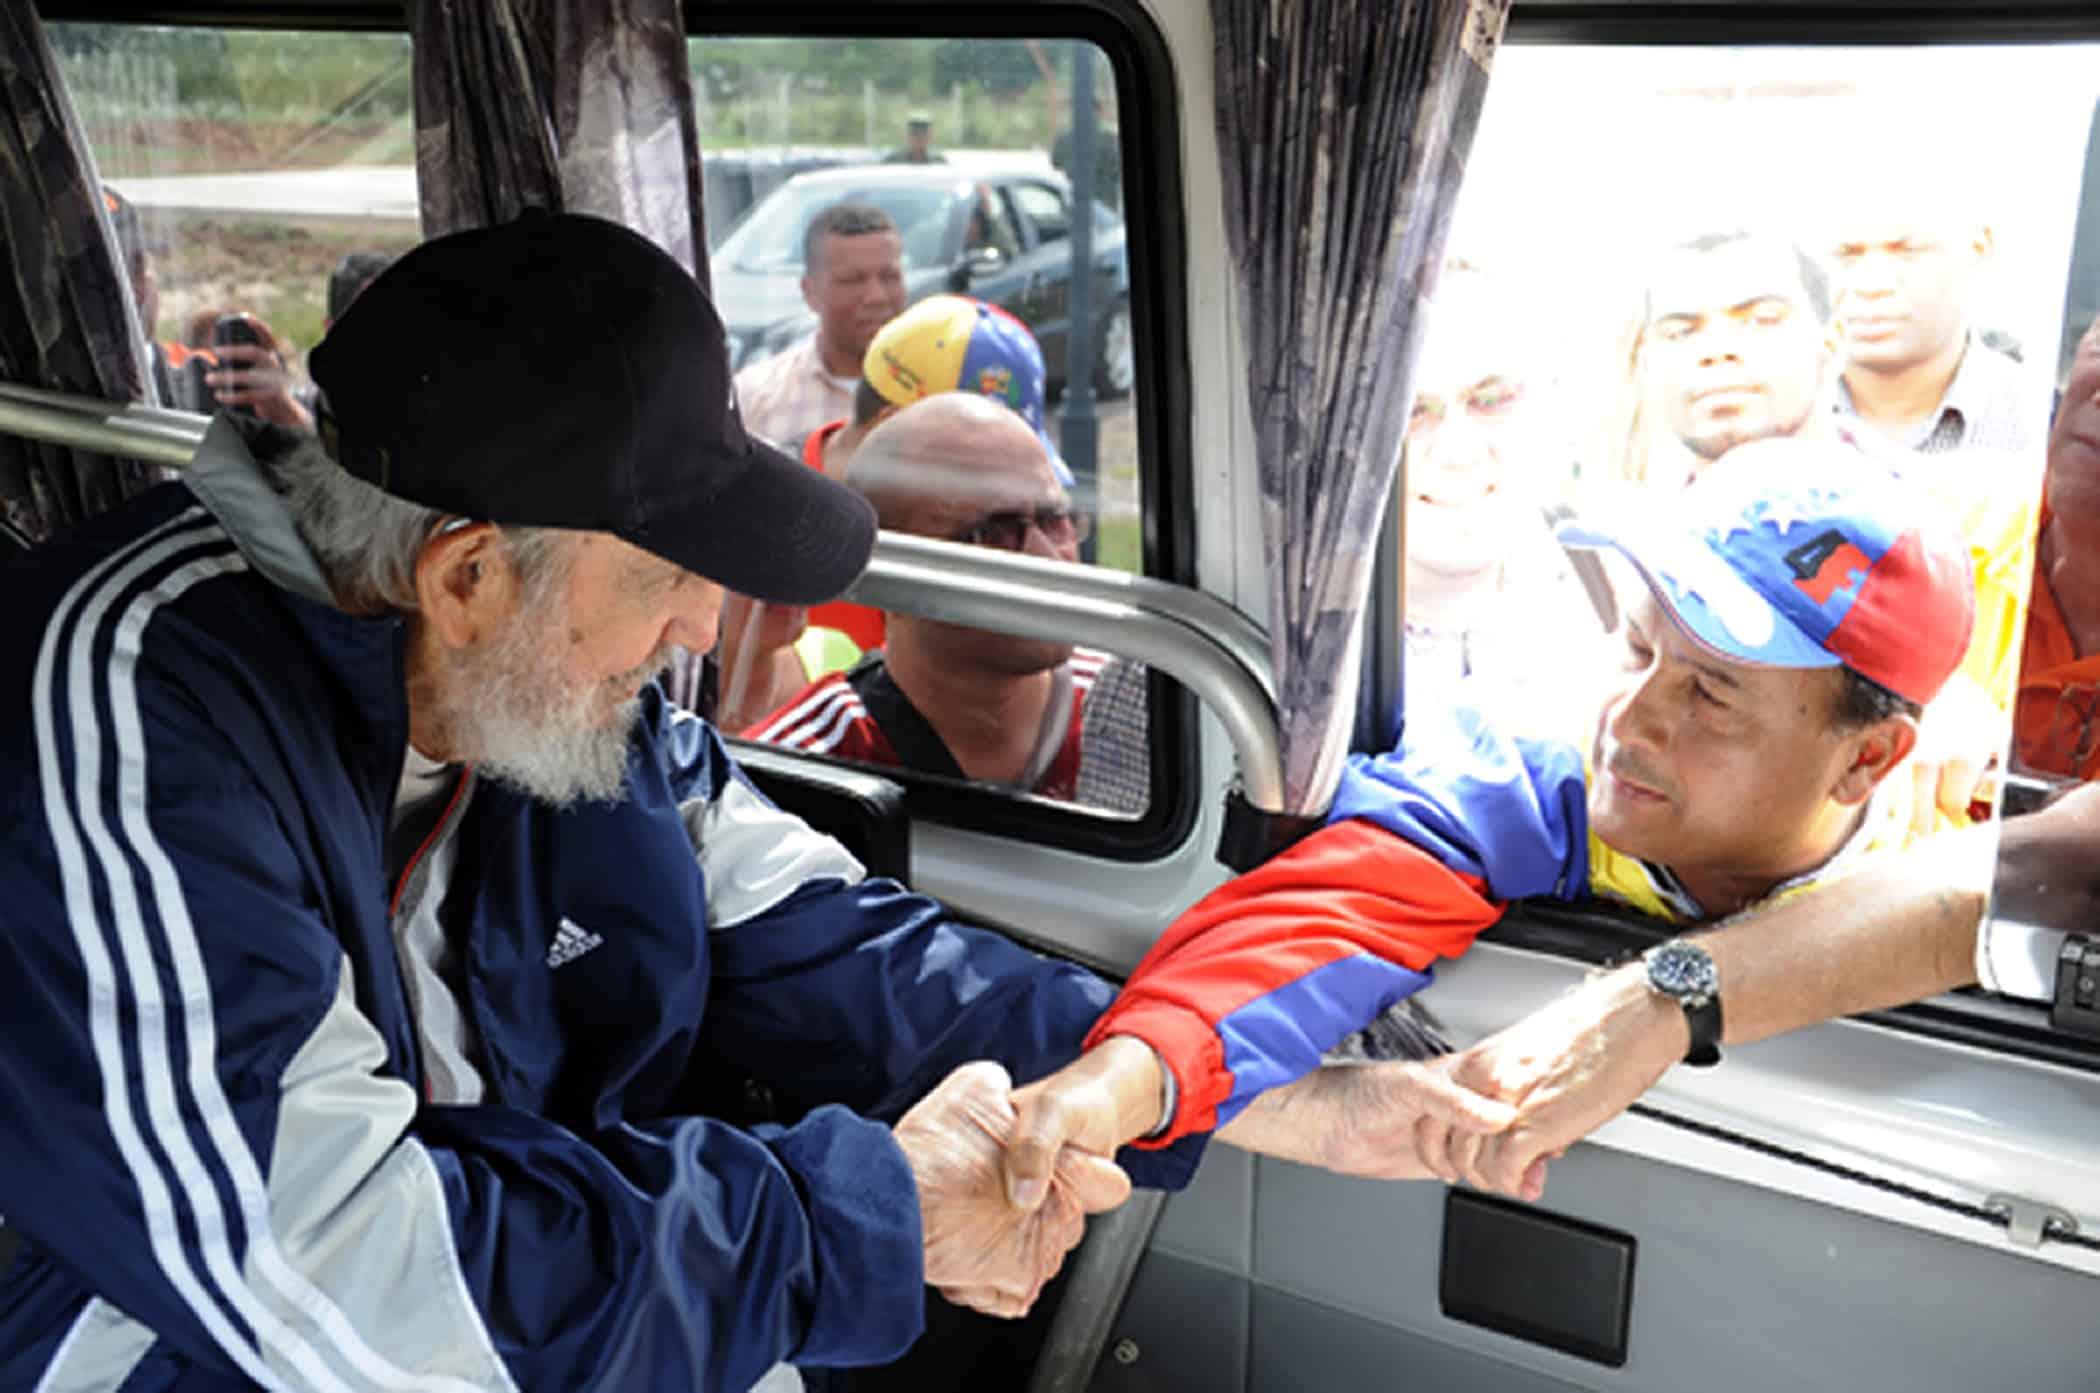 Former Cuban President Fidel Castro greets a member of a Venezuelan delegation.